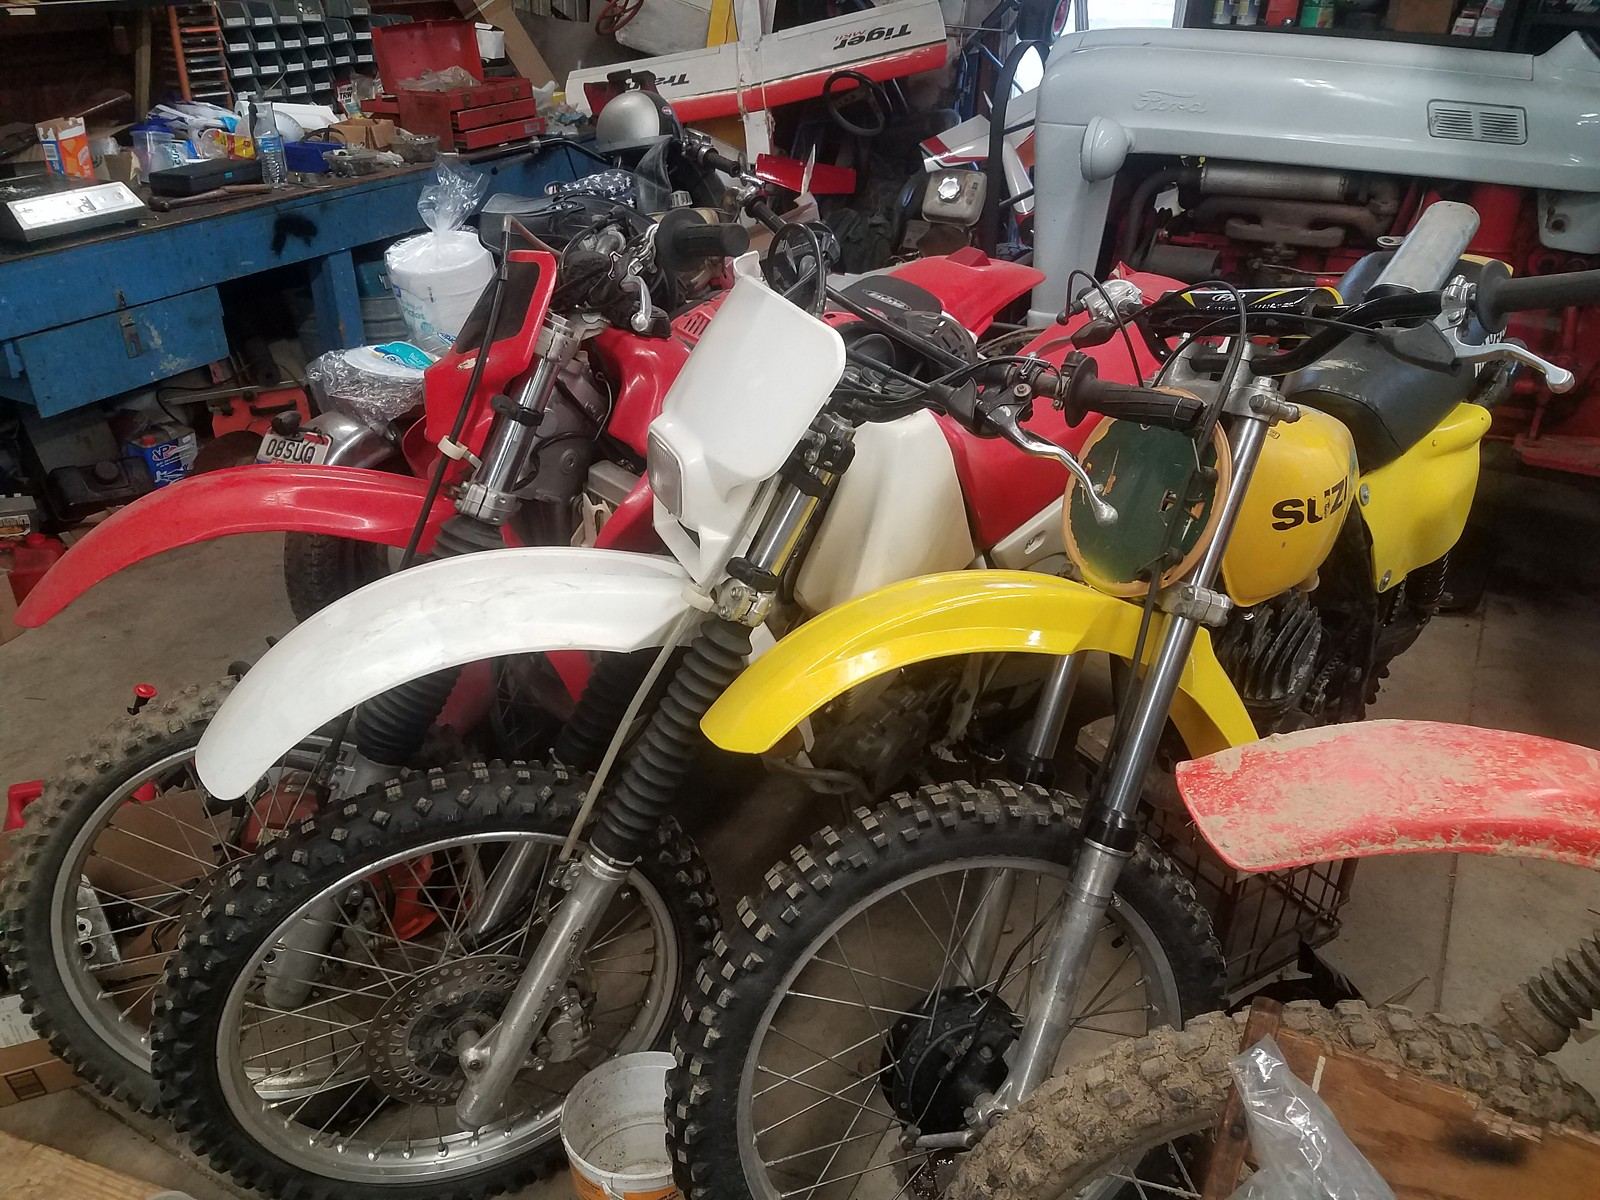 77 Suzuki rm250 - mpeters - Motocross Pictures - Vital MX